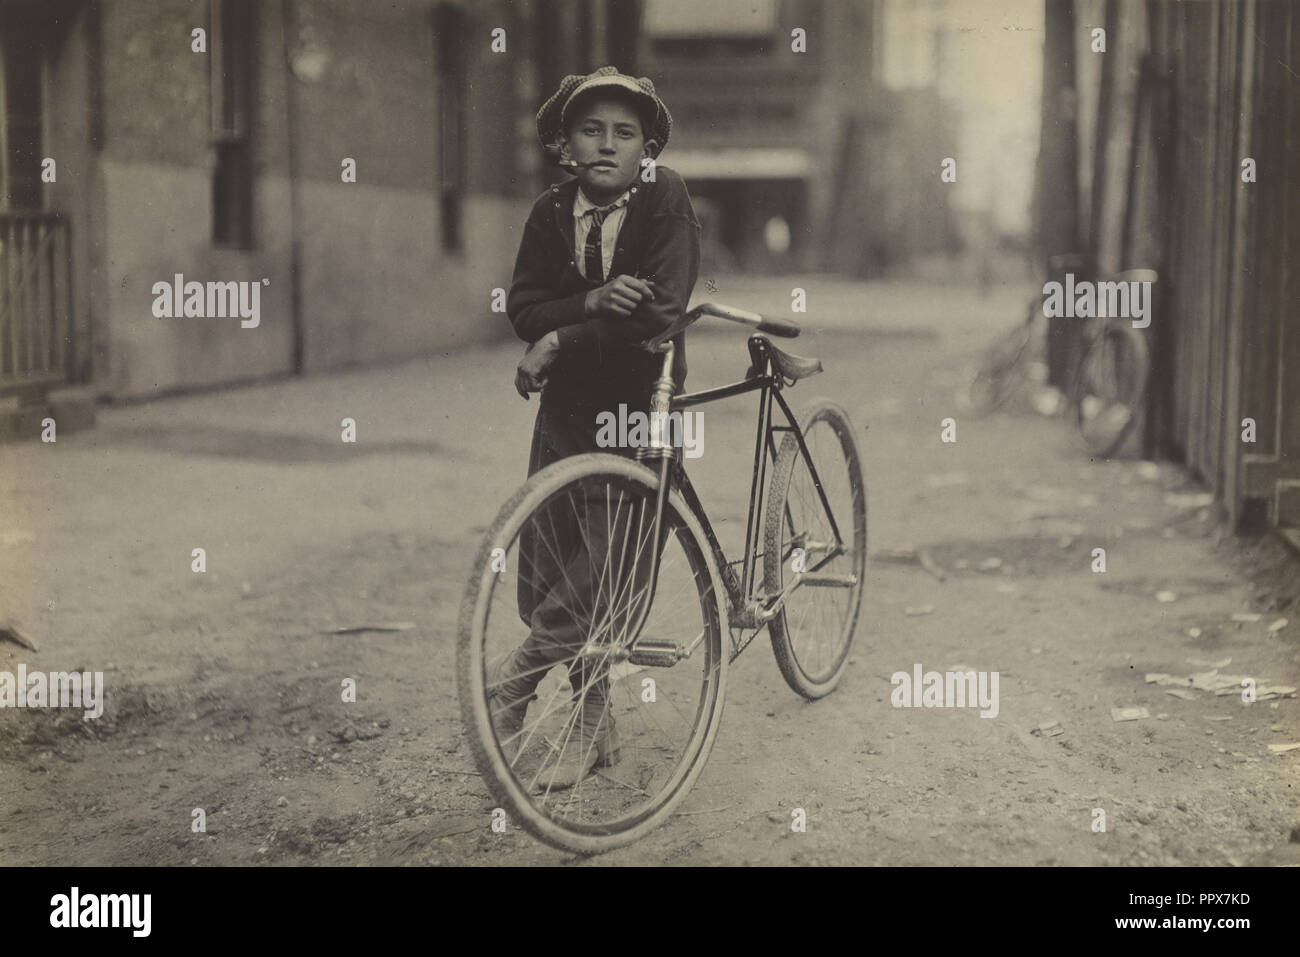 Messenger Boy for Mackay Telegraph Company, Waco, Texas; Lewis W. Hine, American, 1874 - 1940, Waco, Texas, United States - Stock Image